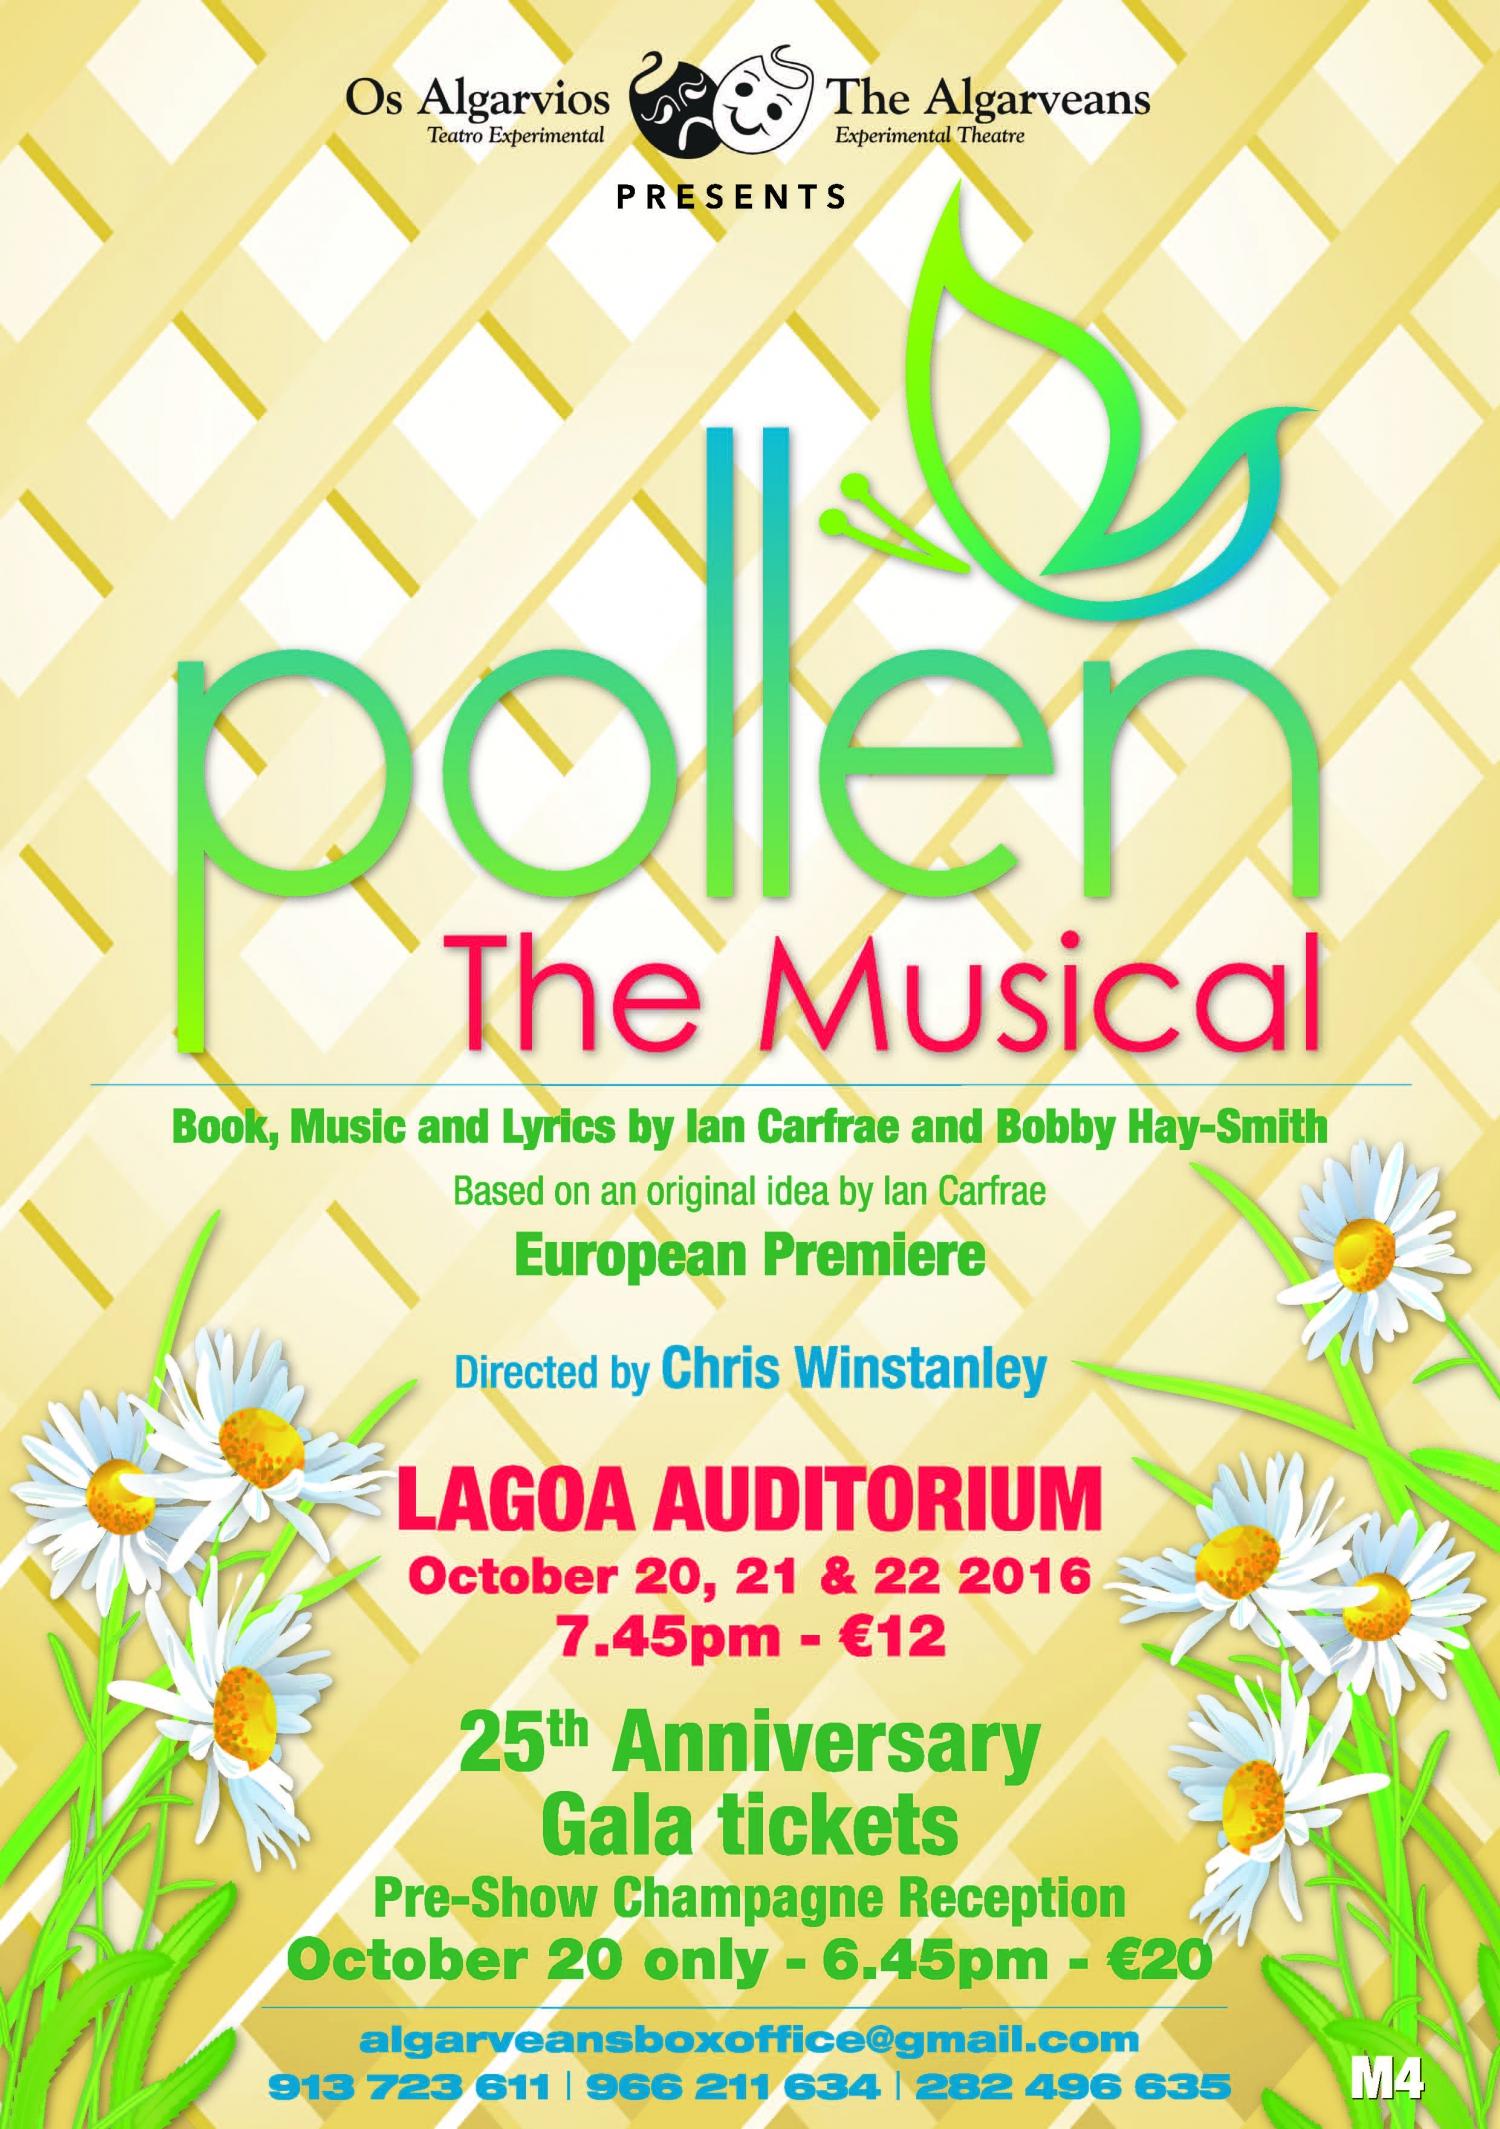 Pollen - the Musical